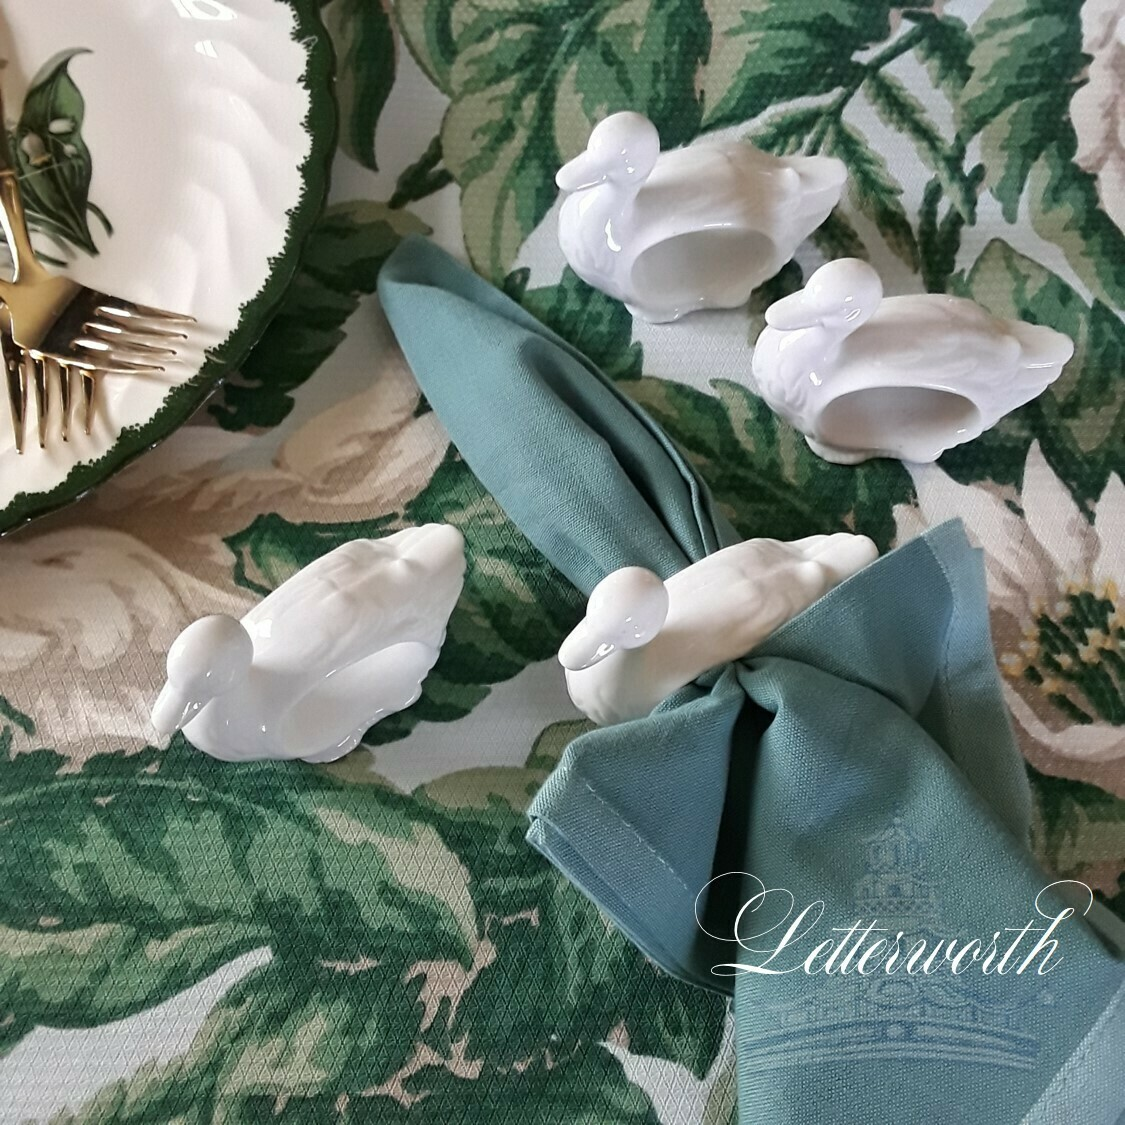 Set of 4 Vintage White Porcelain Swan Napkin Rings